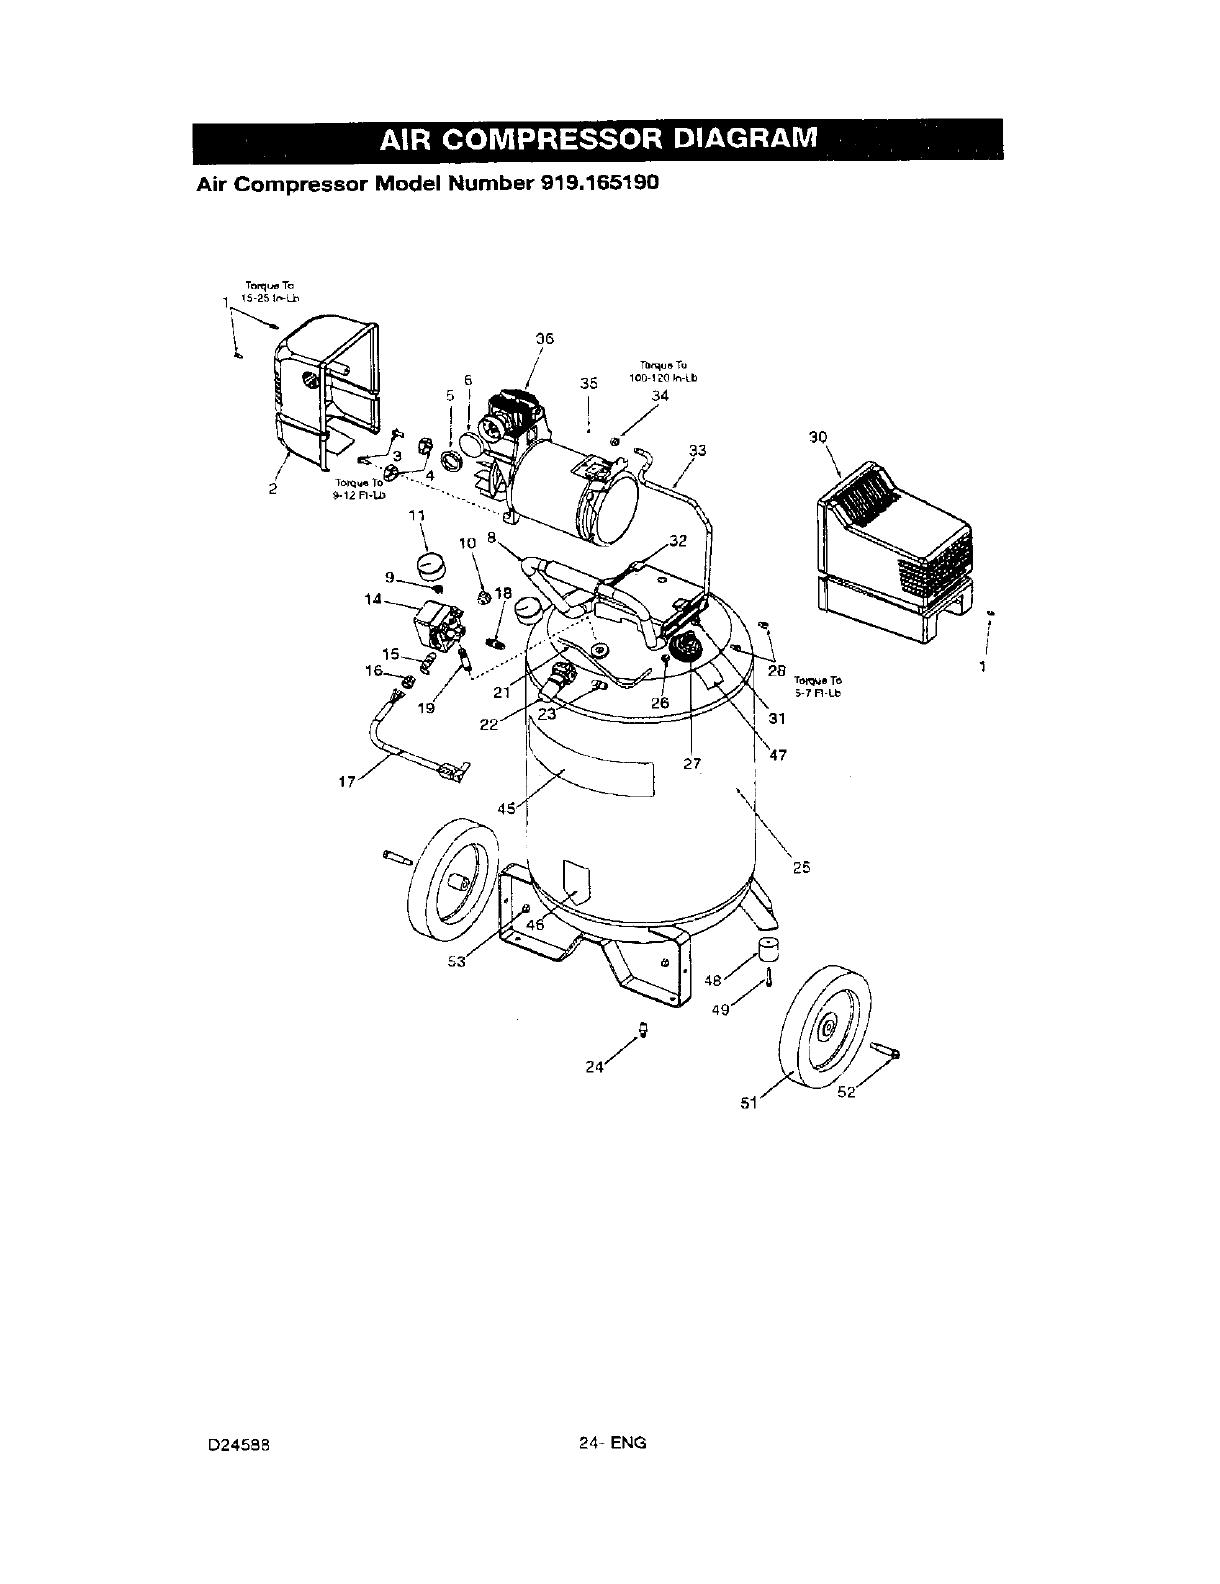 Craftsman 919165190 User Manual AIR COMPRESSOR Manuals And